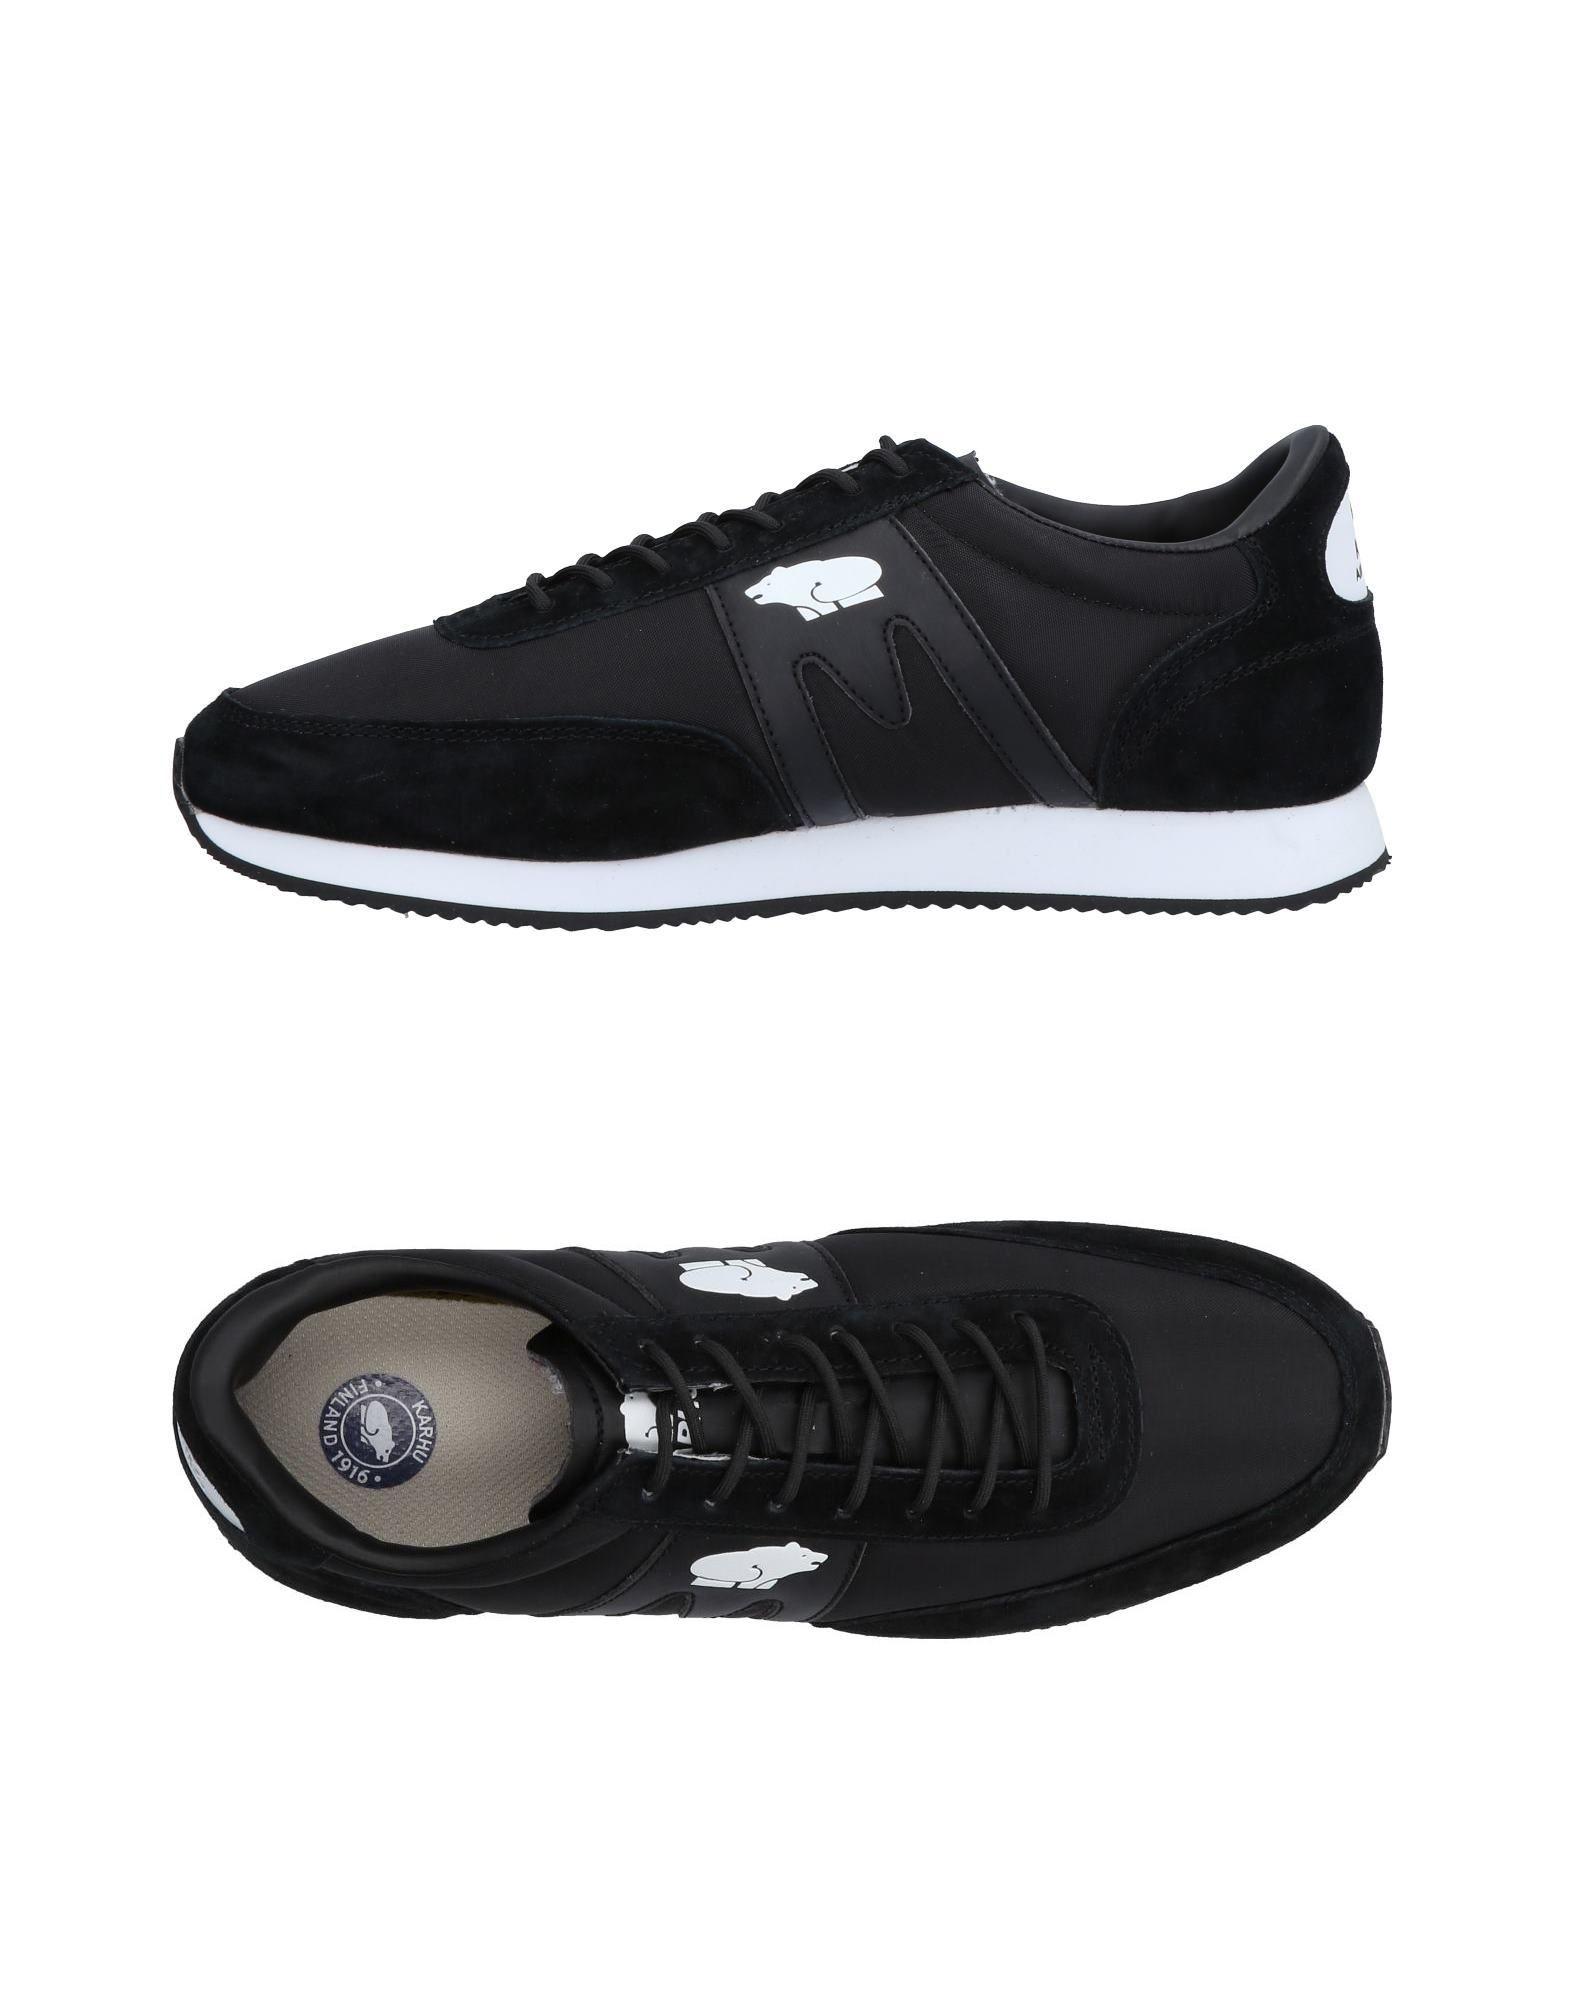 Moda Sneakers Karhu Uomo - 11496506ND